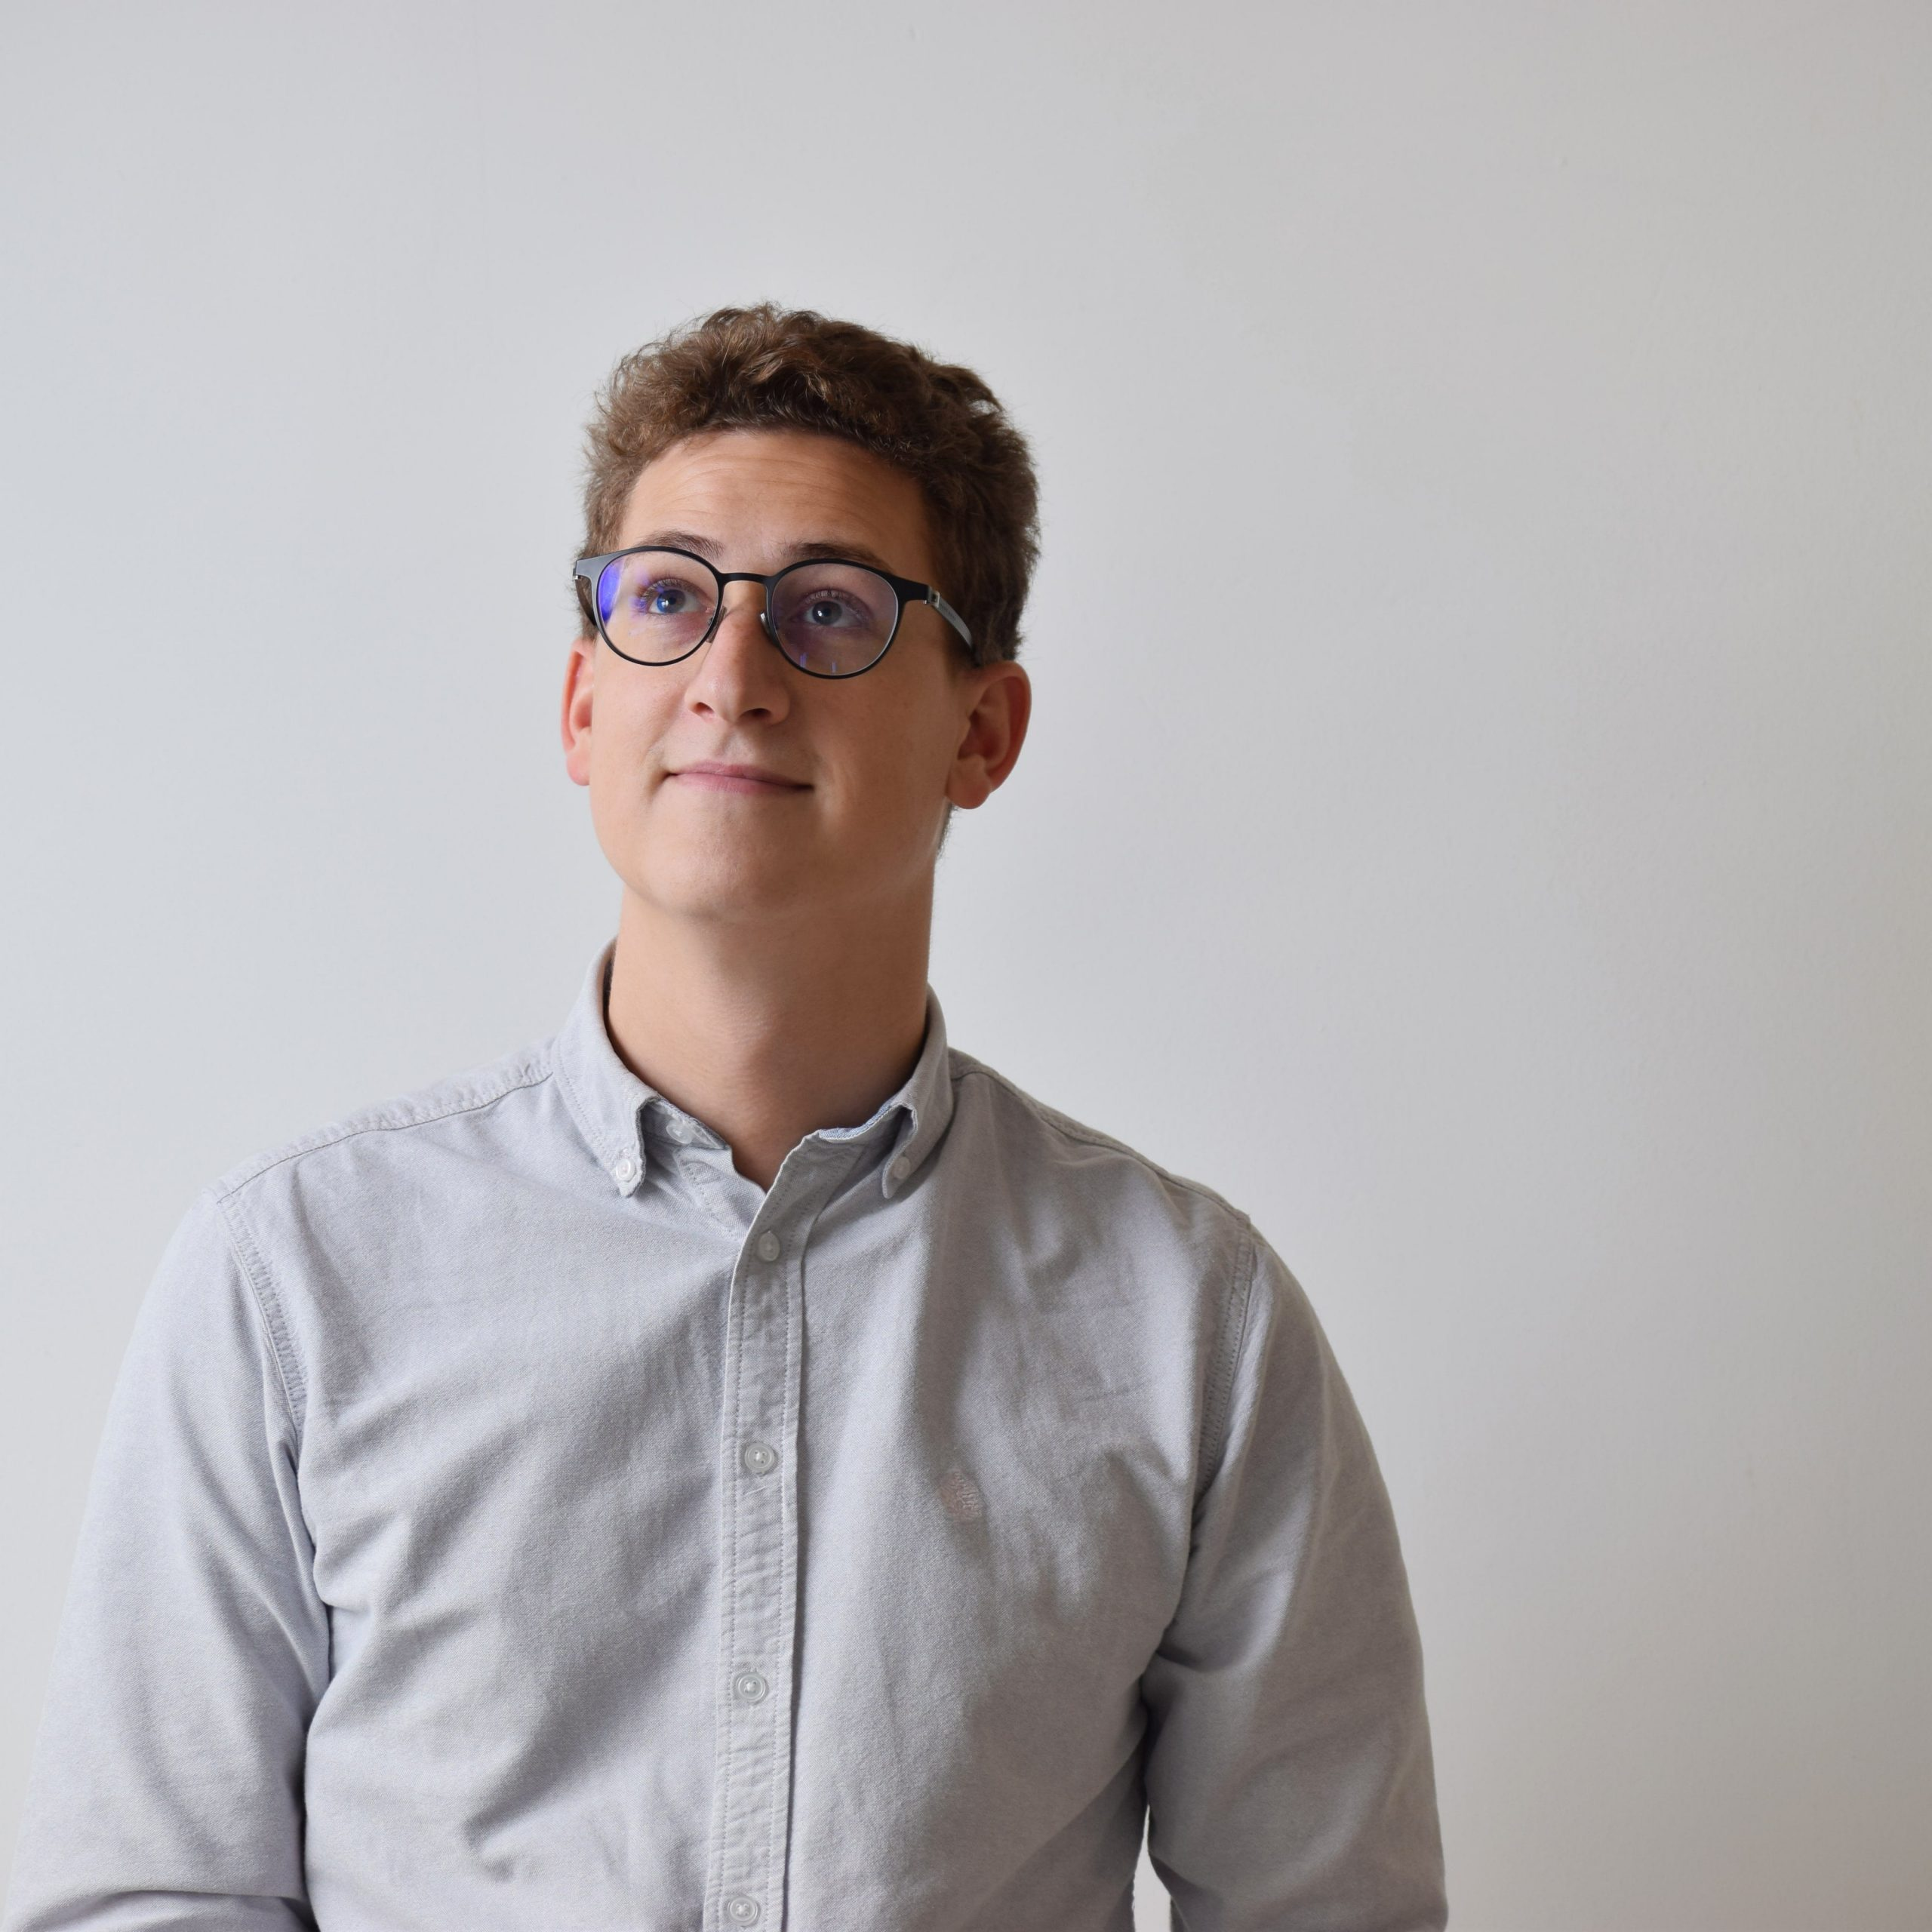 Larkom Webdesign in Londerzeel Team Zaakvoerder Joris Rottiers 1